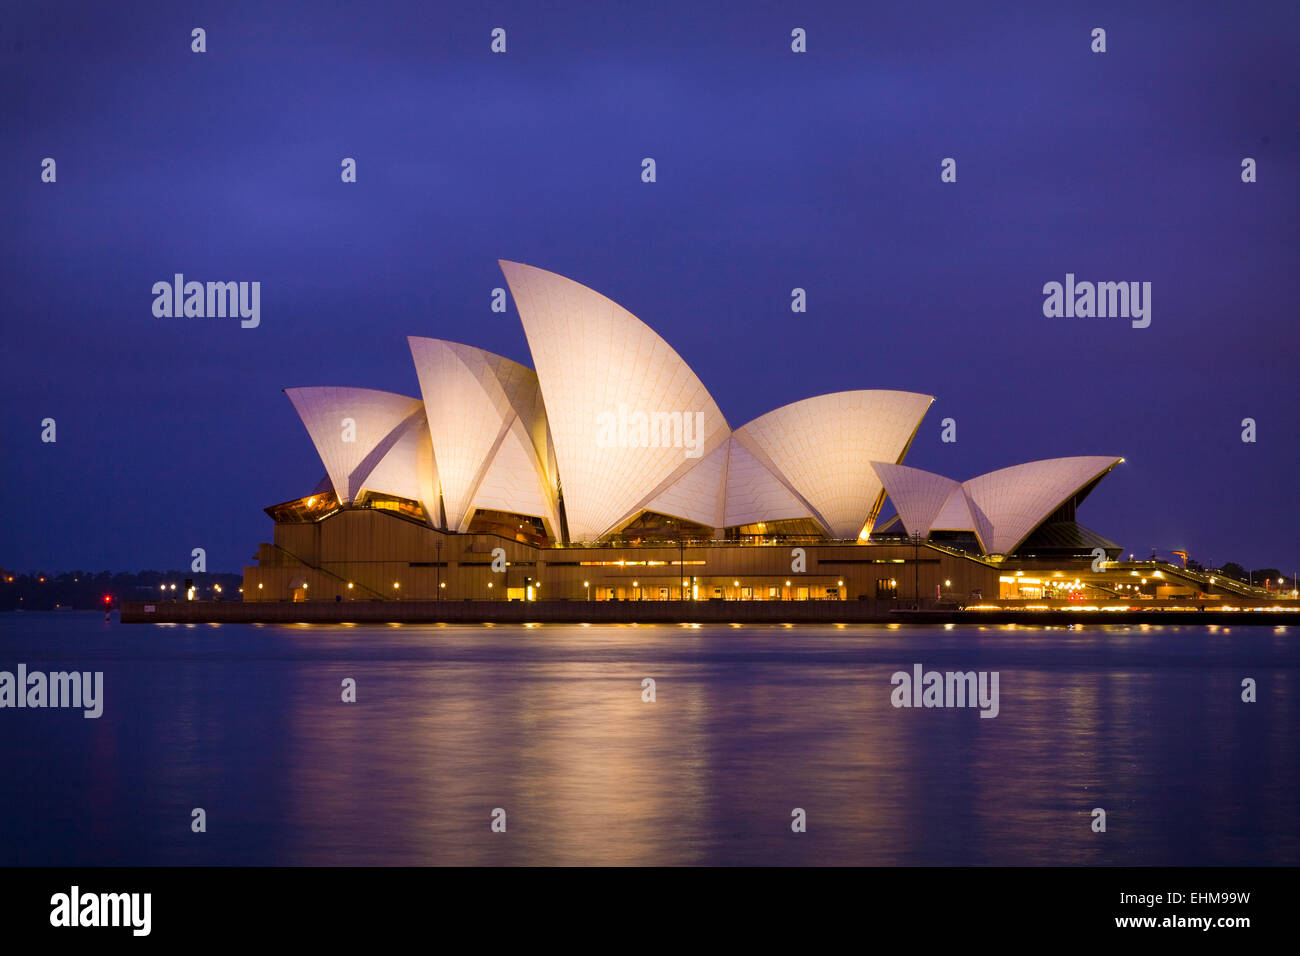 Sydney Opera House, Australia - Stock Image